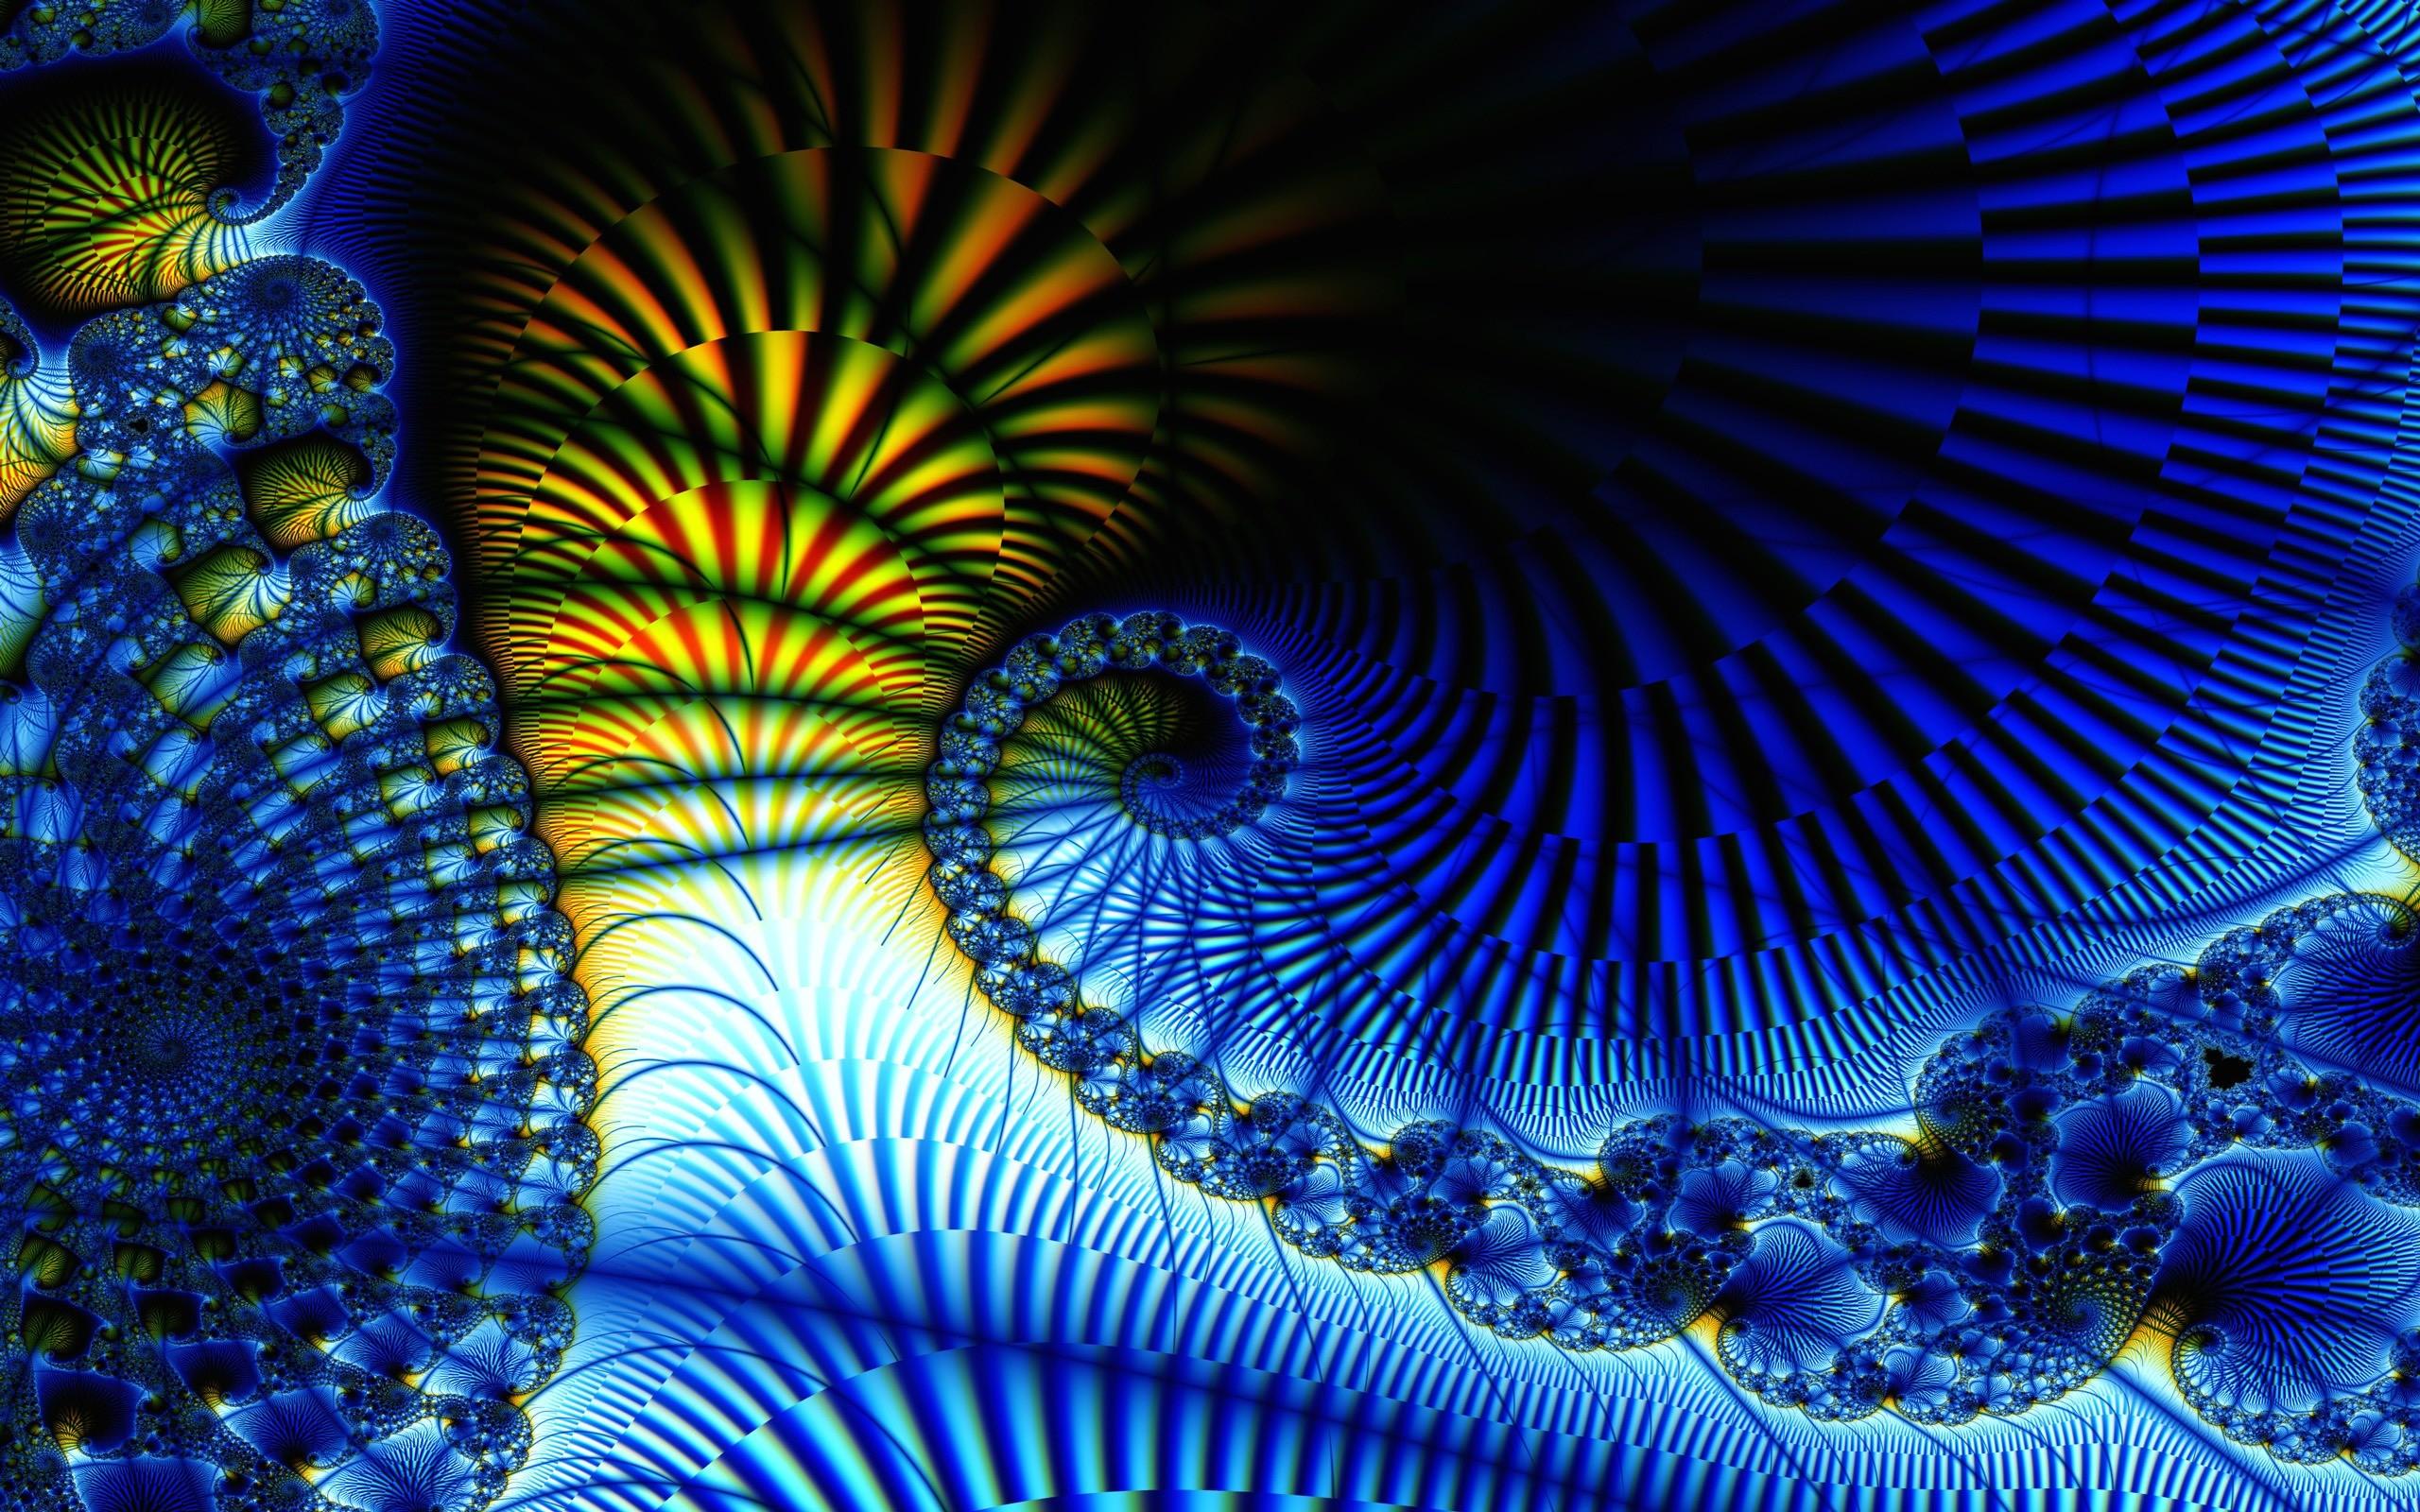 free fractal wallpaper windows apple tablet 4k high definition samsung  wallpapers free download 2560×1600